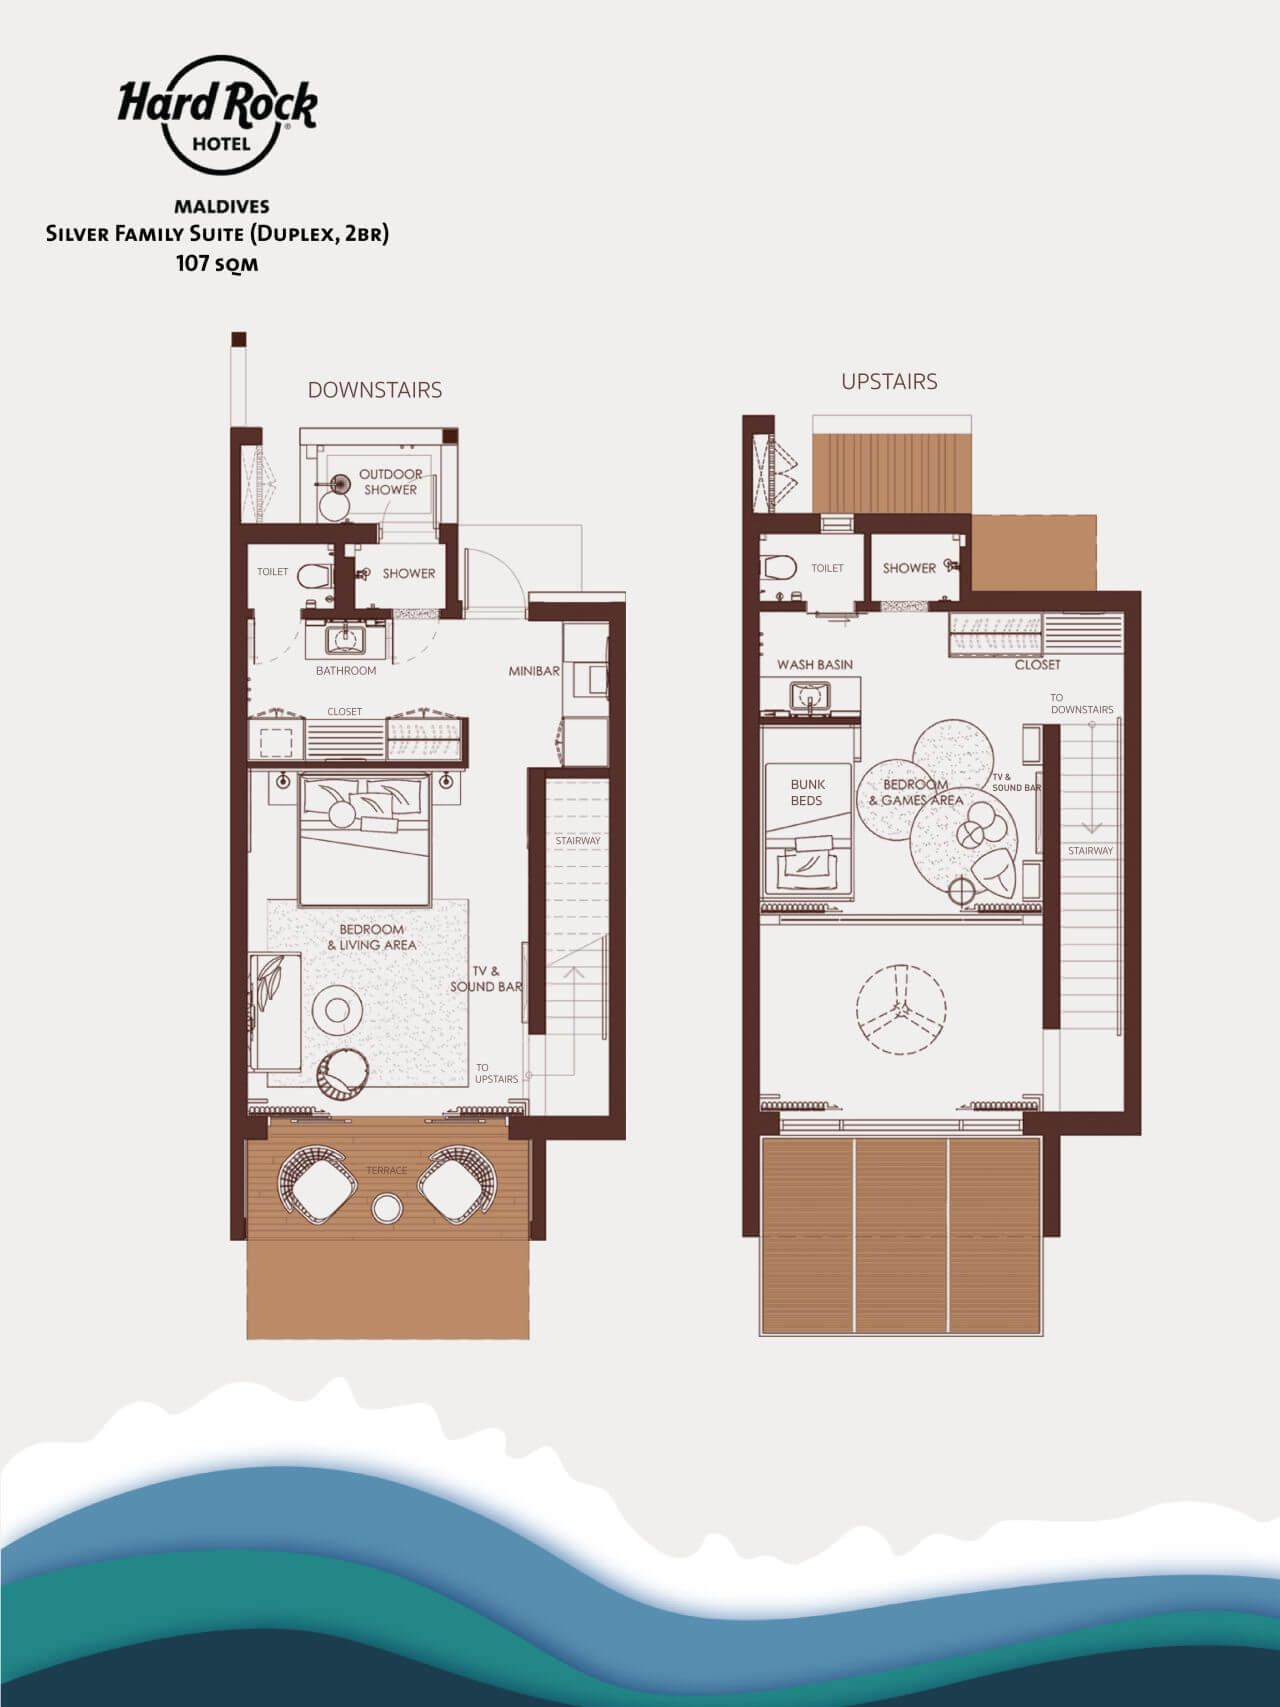 Hard Rock Hotel Maldives Silver Family Suite Duplex 2br 107 Sqm Hard Rock Hotel Hotel Room Design Plan Hotel Plan